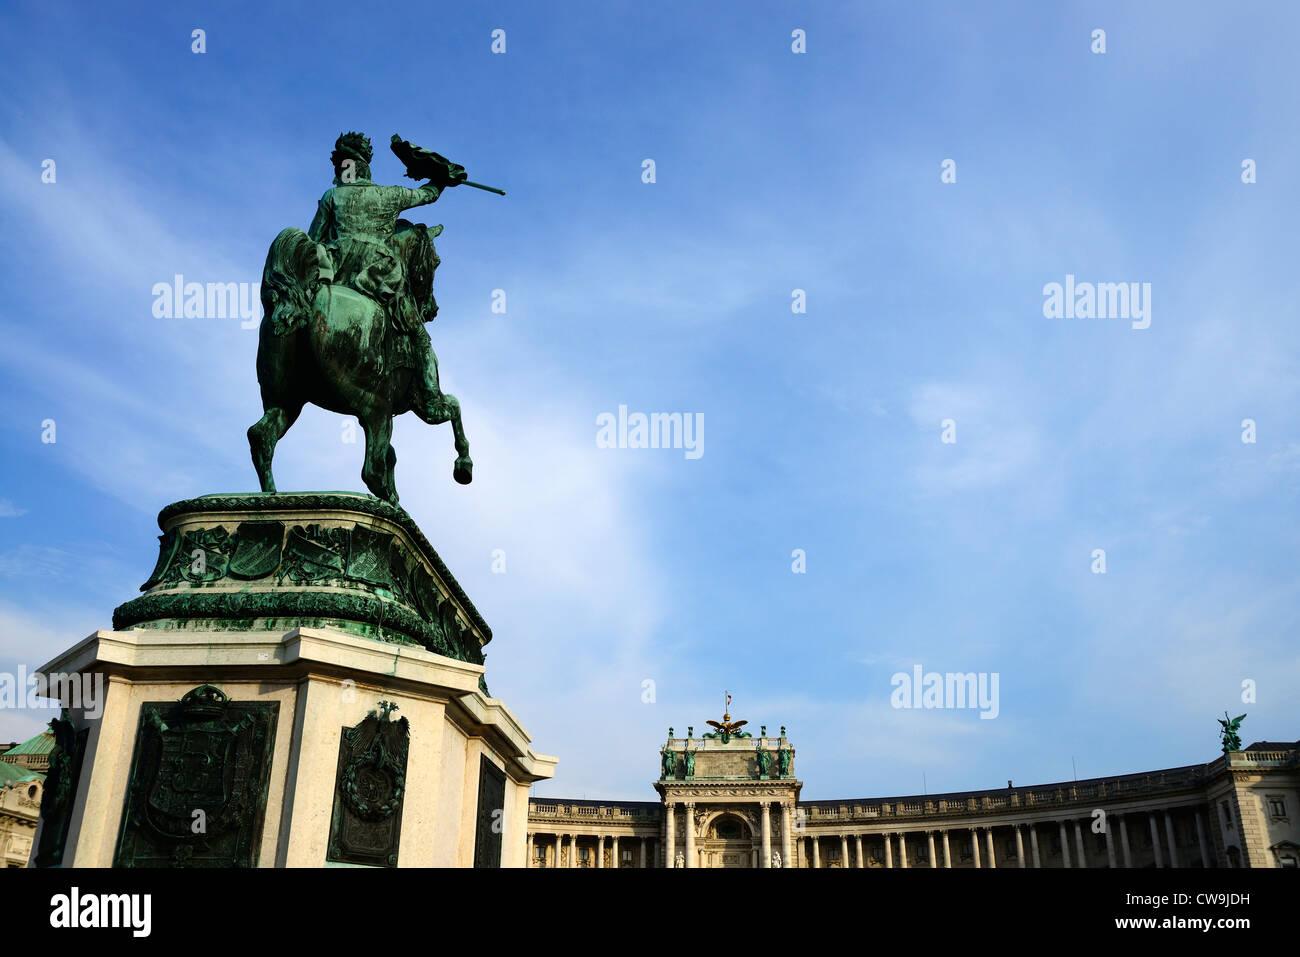 Heldenplatz: Staue of Archduke Charles, Duke of Teschen - Stock Image